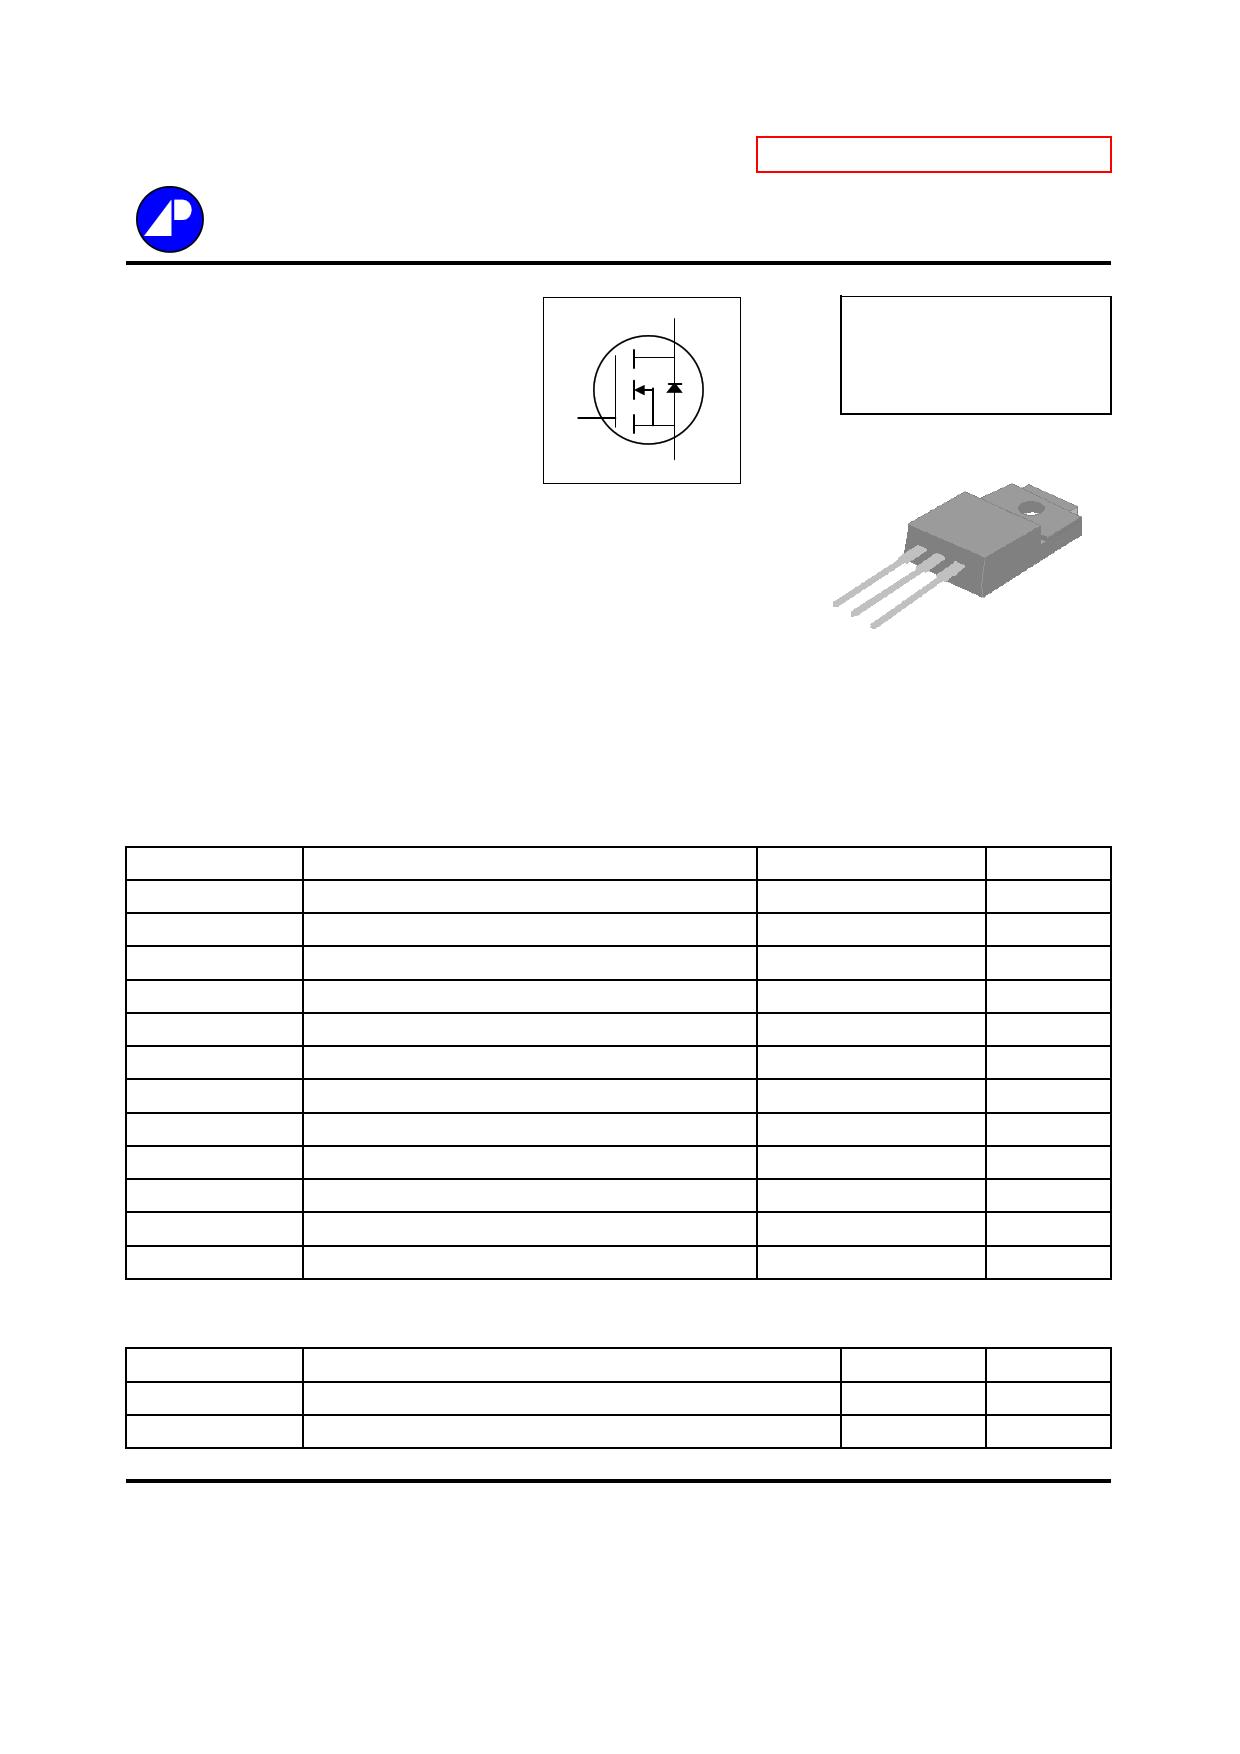 04N70BF-H image